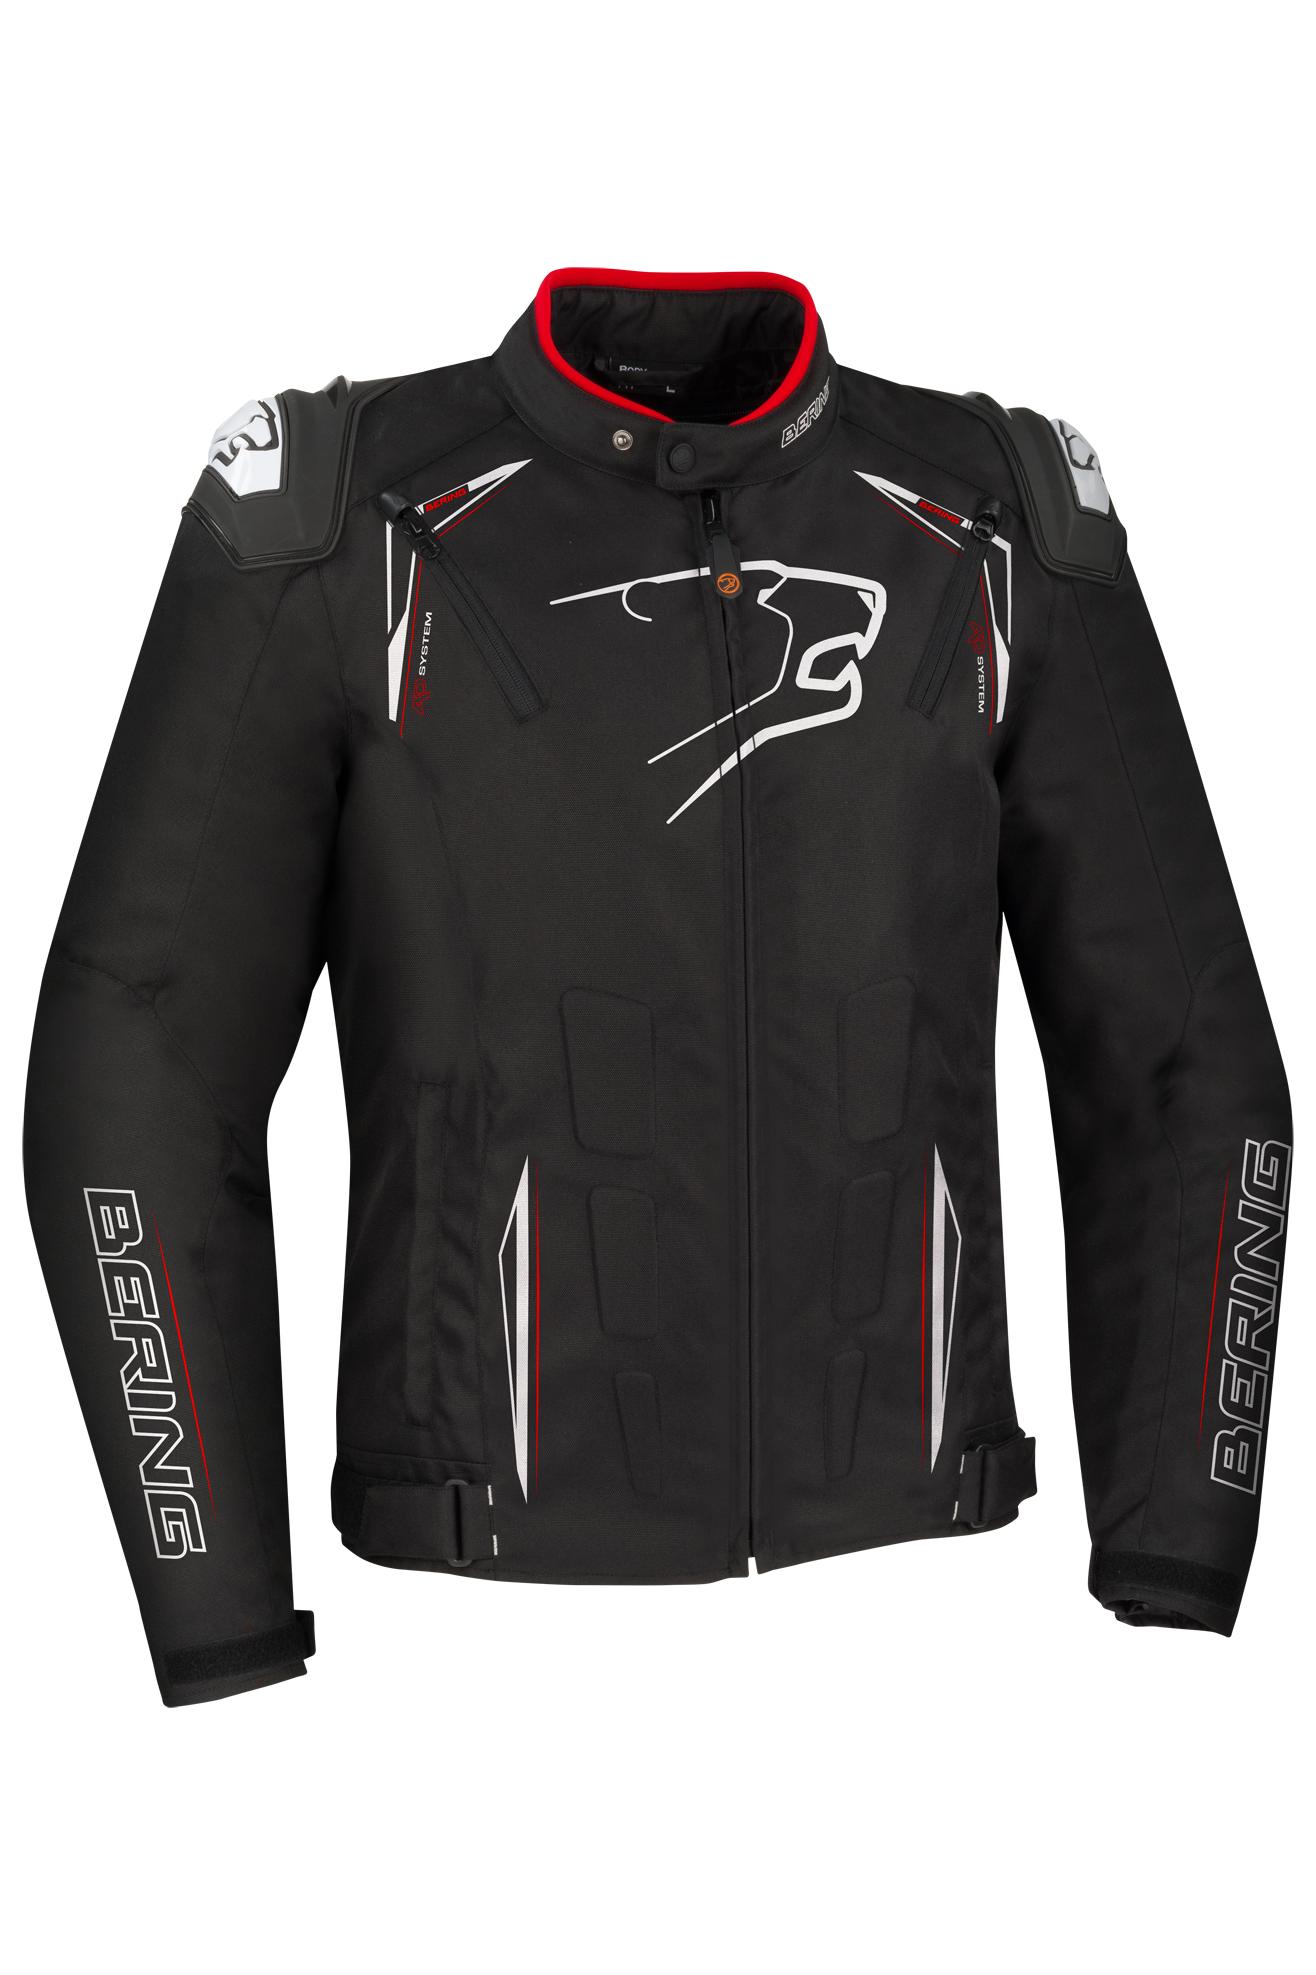 bering giacca moto  start-r nero-bianco-rosso